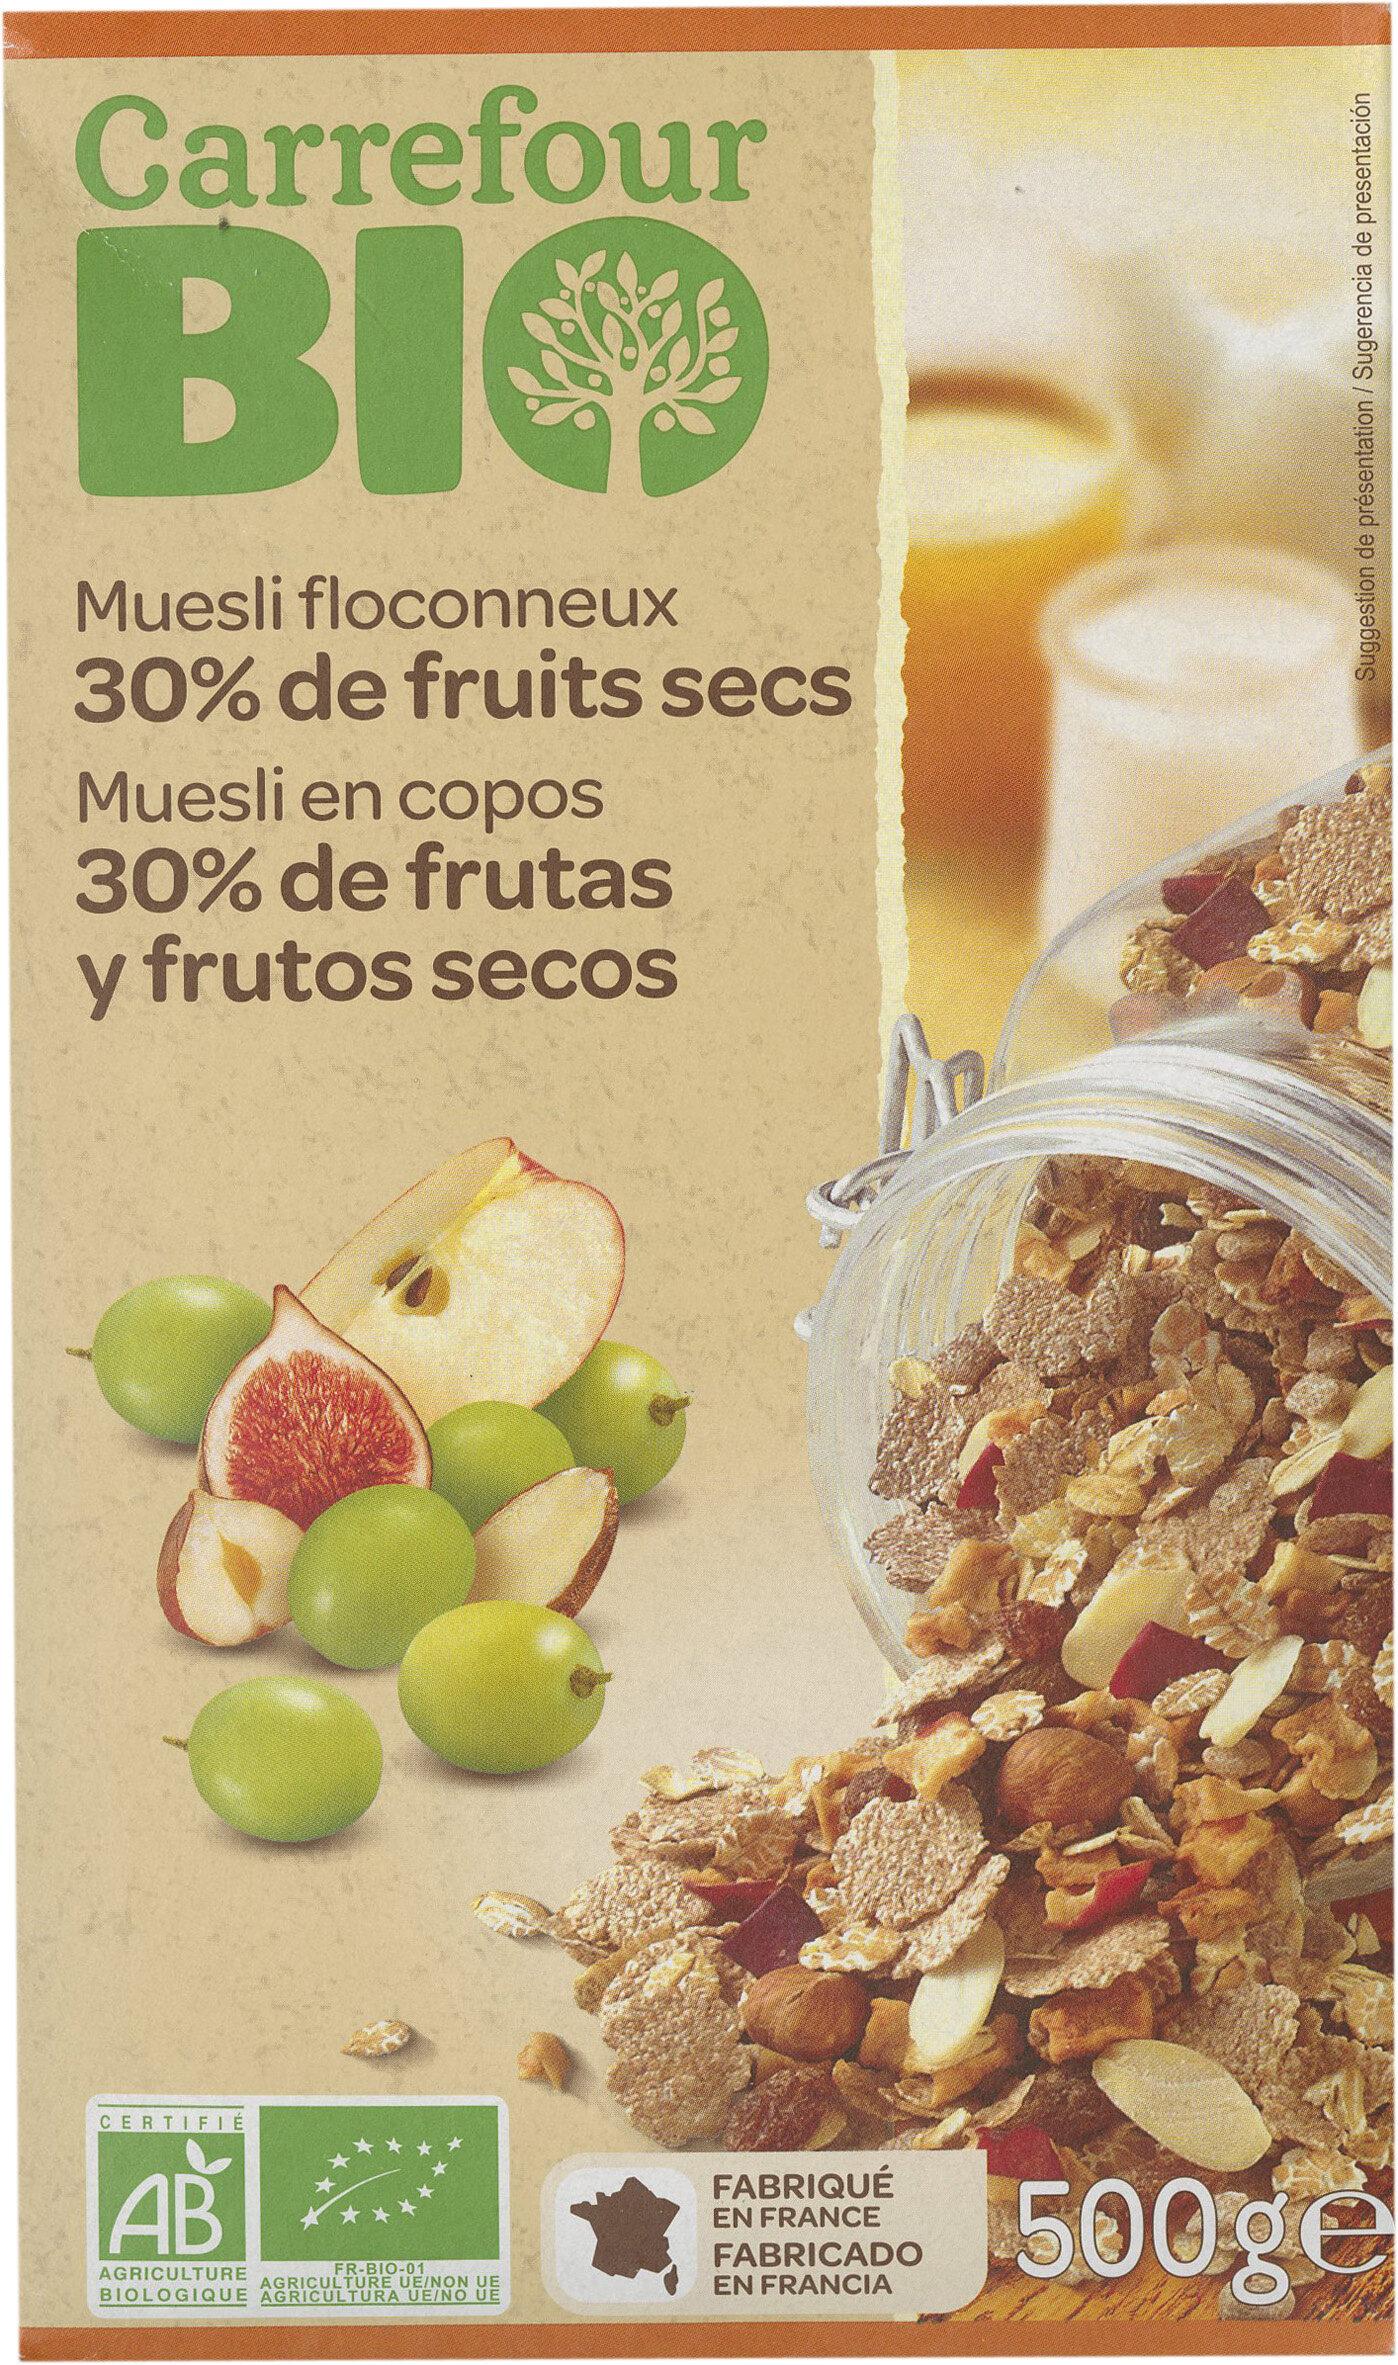 Muesli floconneux 30% fruits secs - نتاج - fr